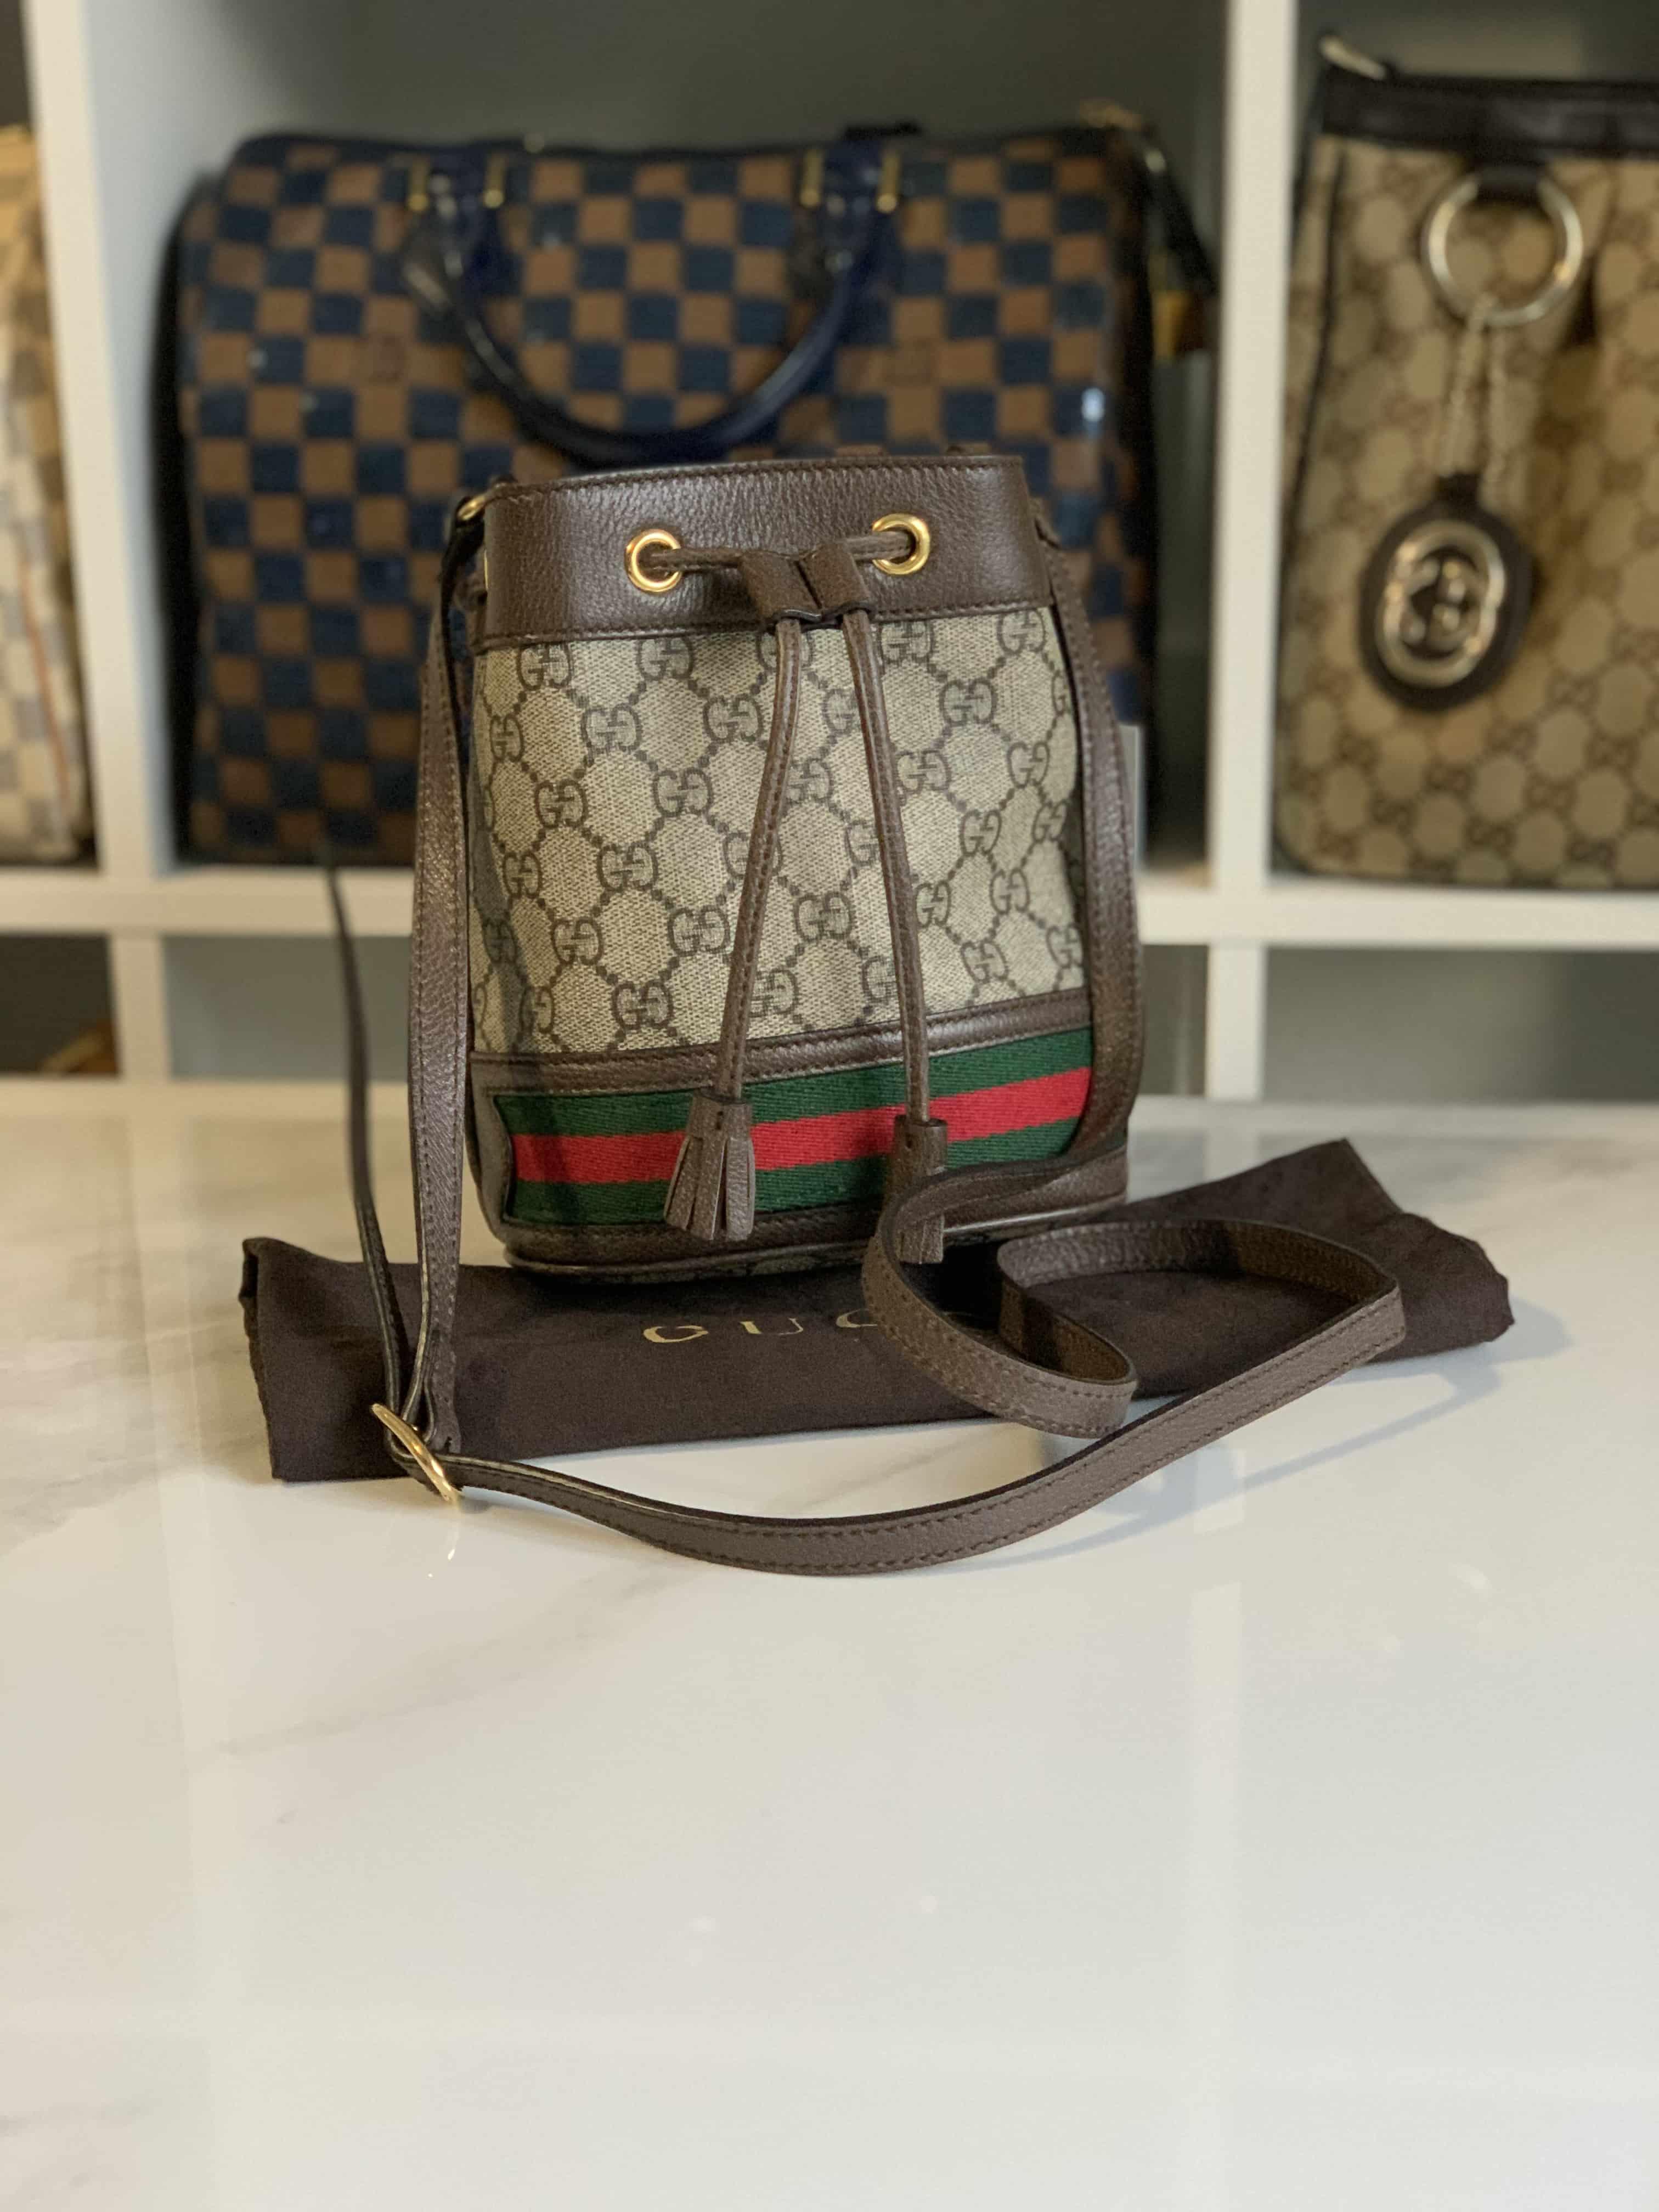 Gucci Gg Supreme Monogram Web Mini Ophidia Bucket Bag Brown